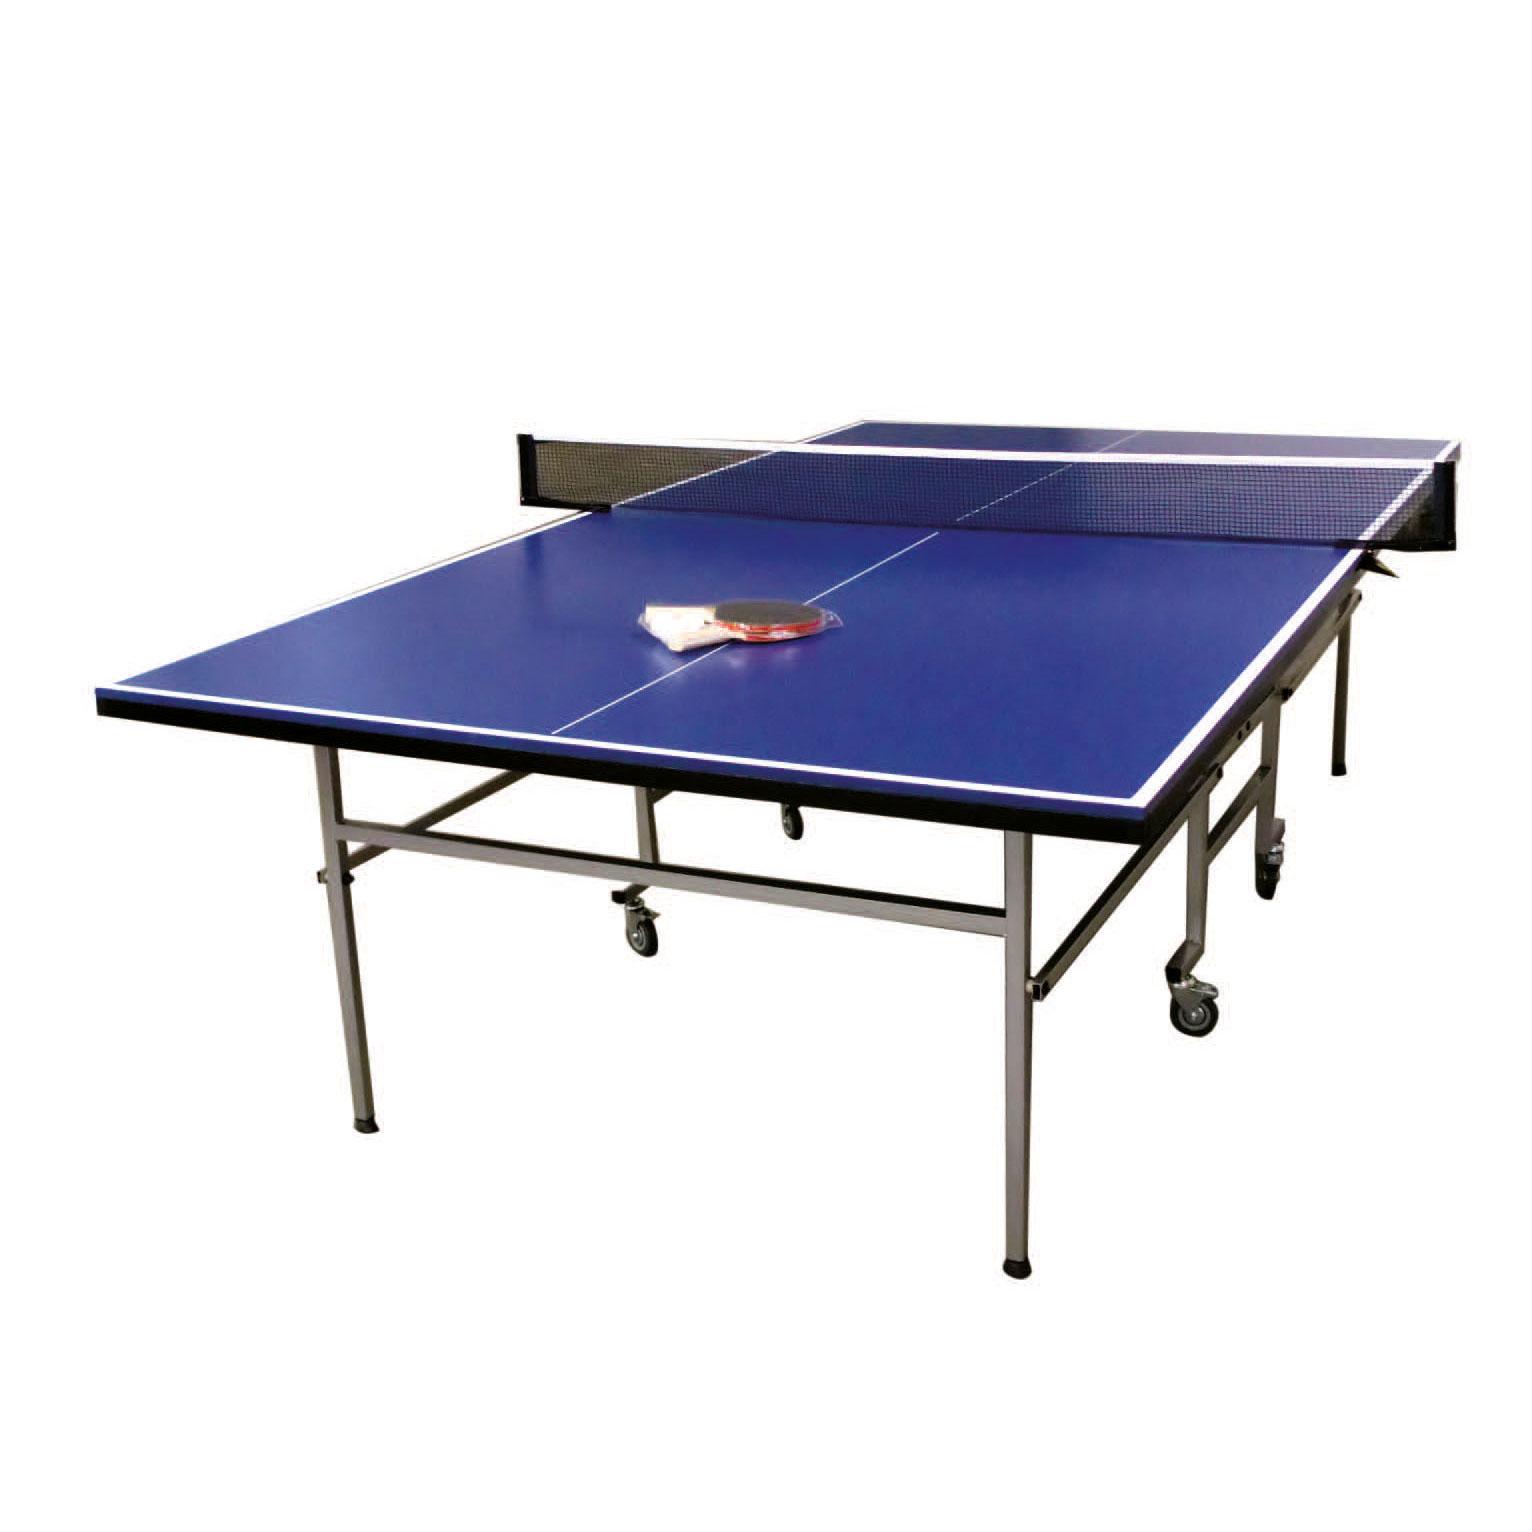 Zaghis simba shopping - Materiale tavolo ping pong ...